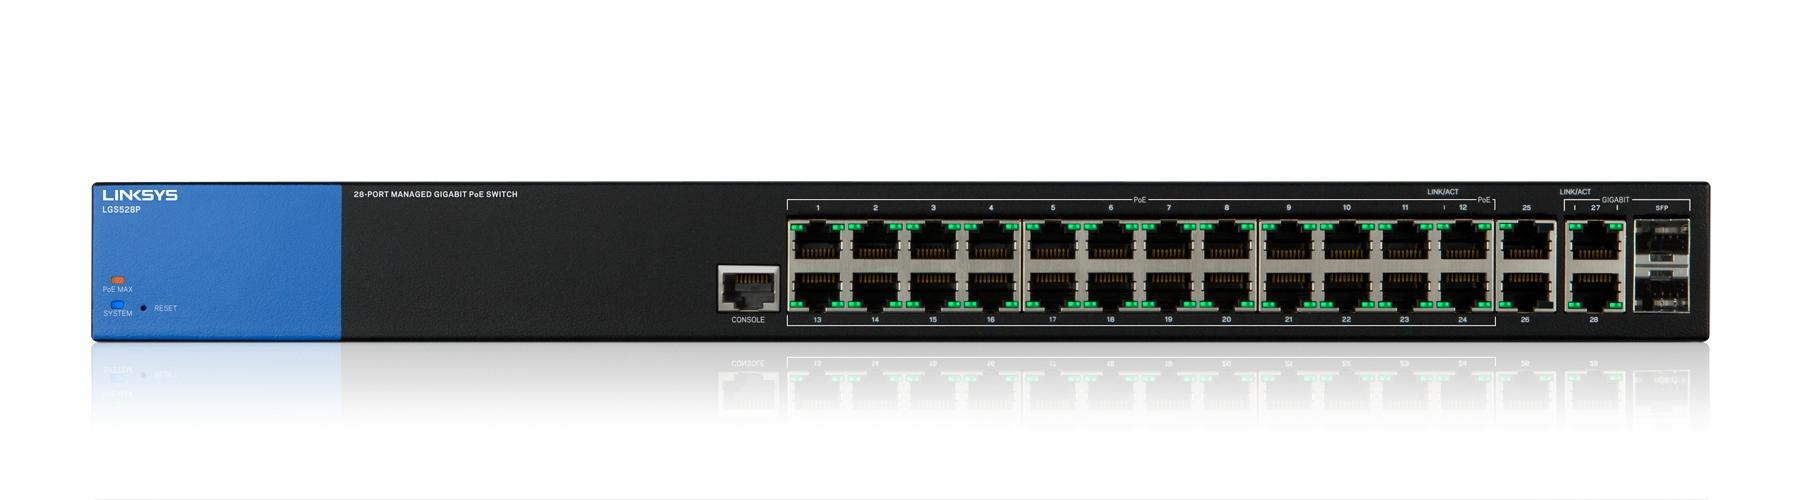 Linksys Switch Gigabit PoE+ administrado de 28 puertos (LGS528P)